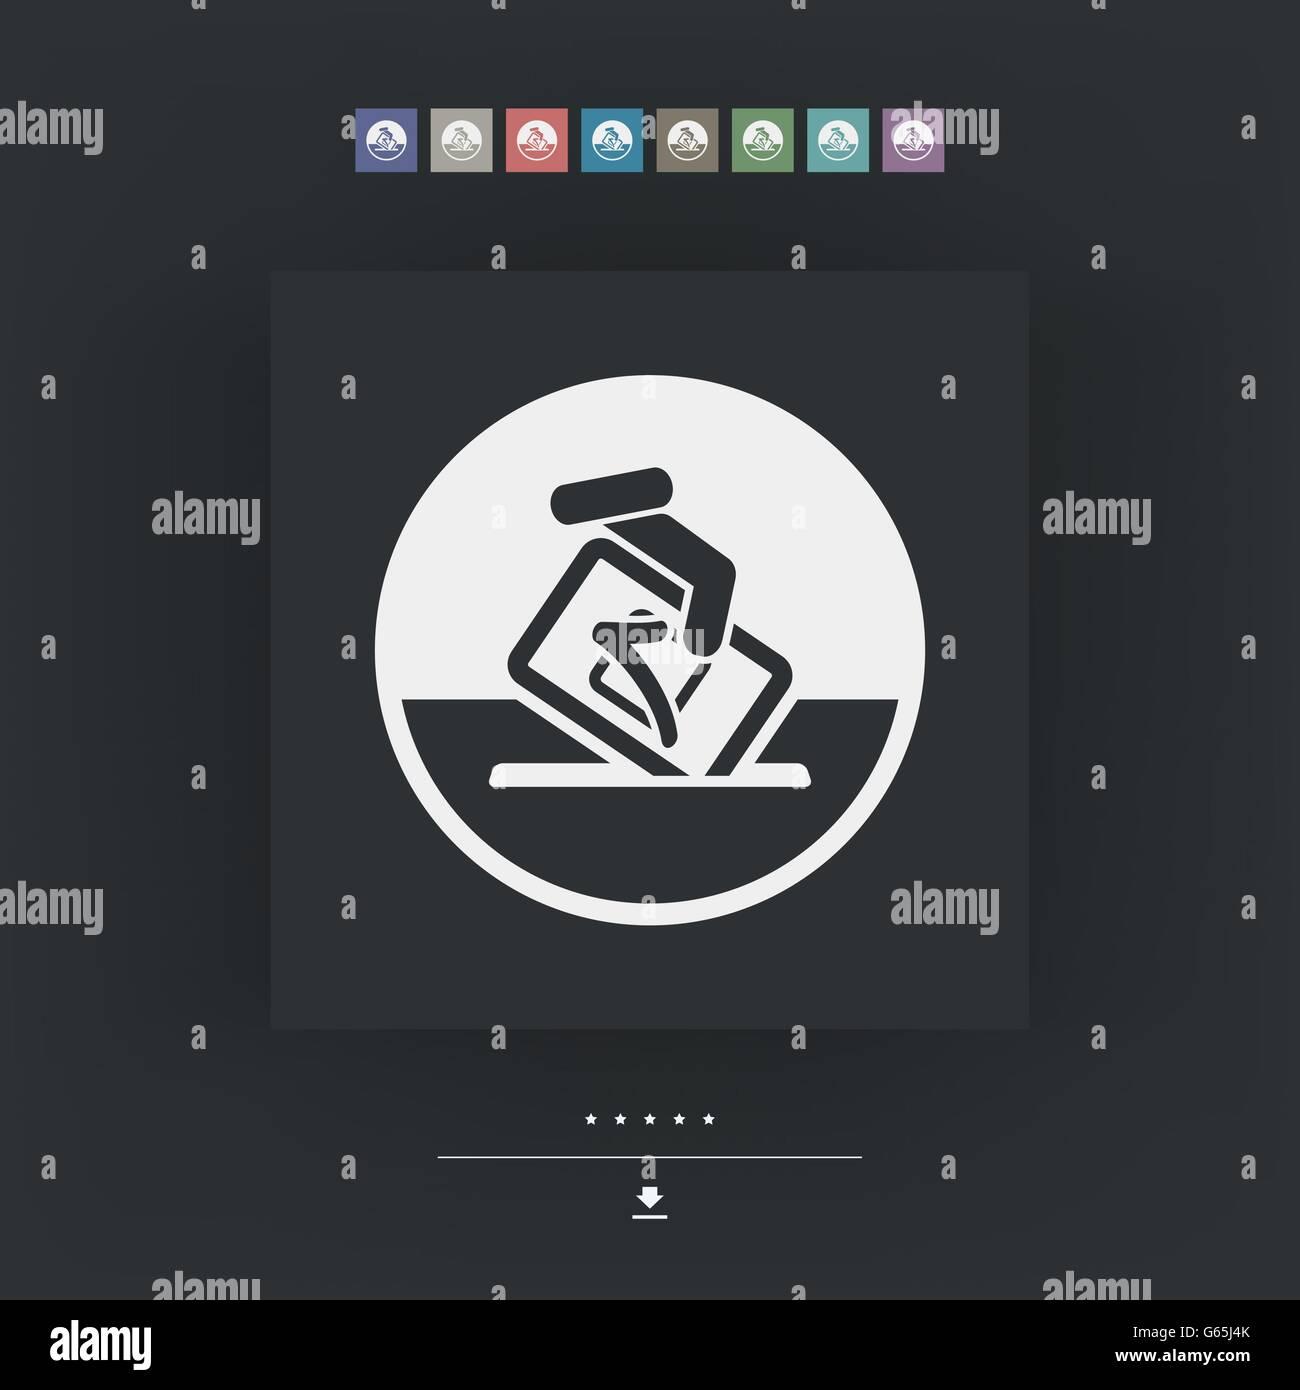 Vote symbol icon Stock Vector